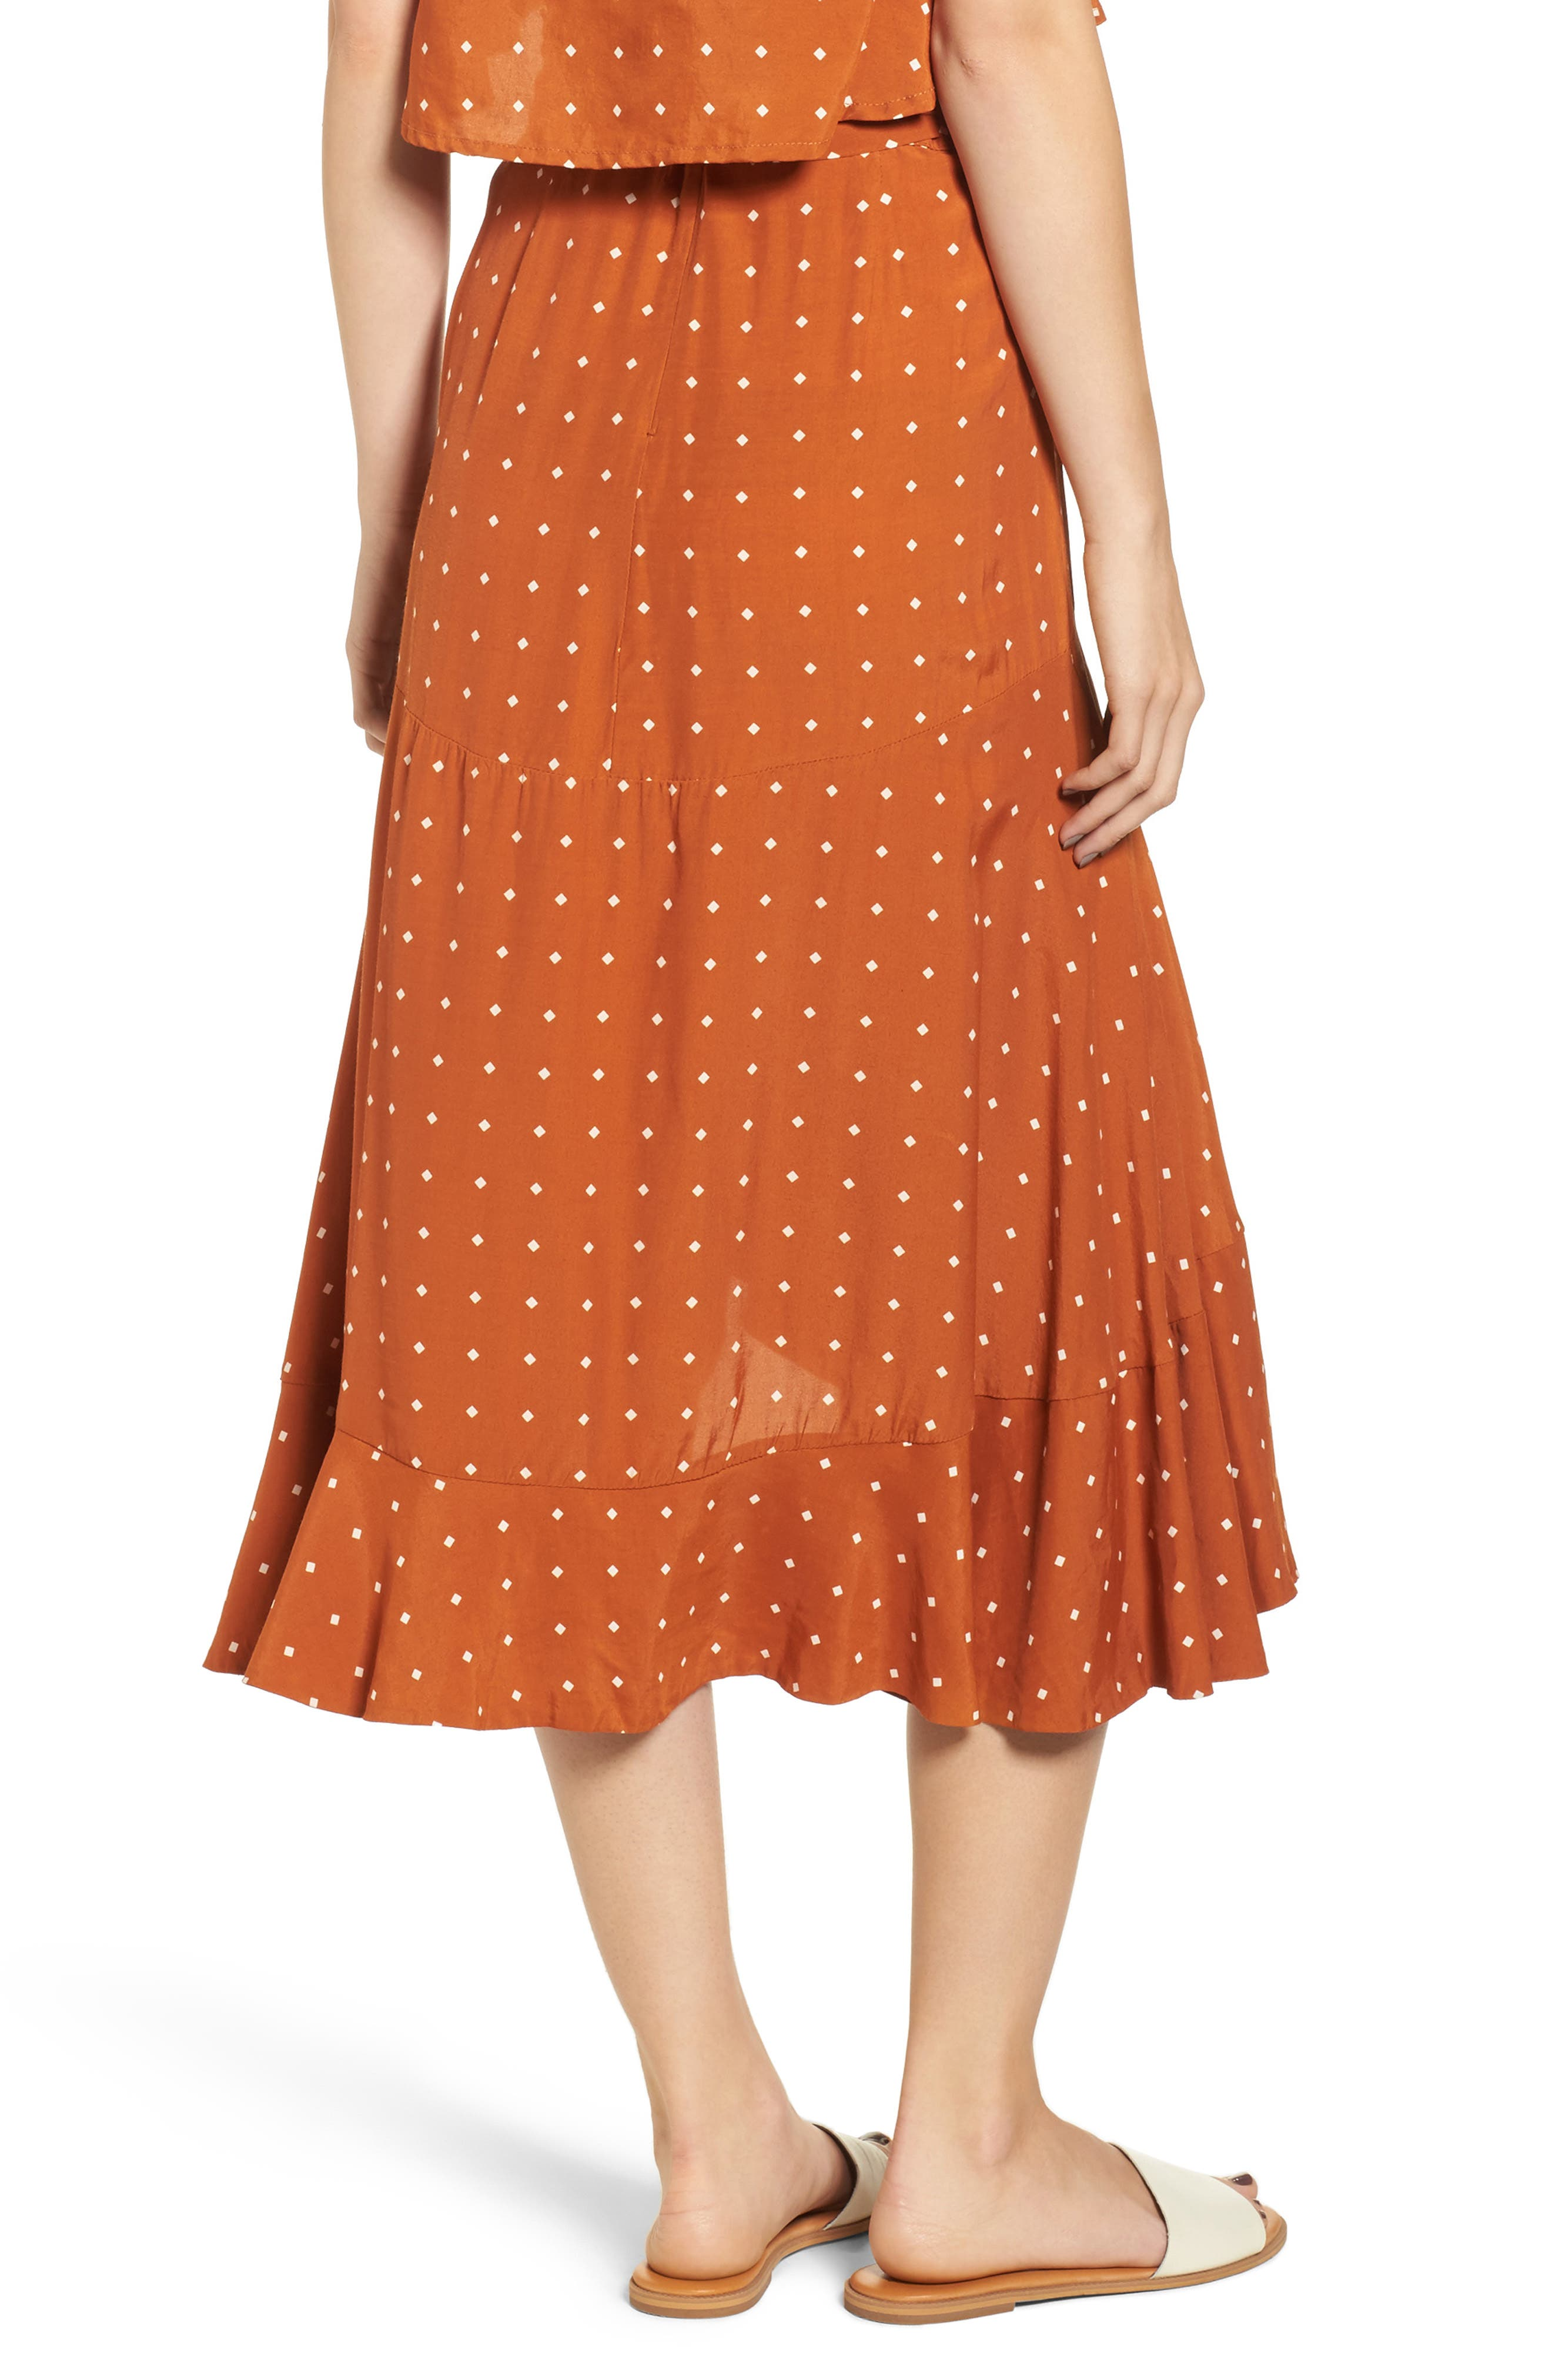 Kamares Polka Dot Midi Skirt,                             Alternate thumbnail 2, color,